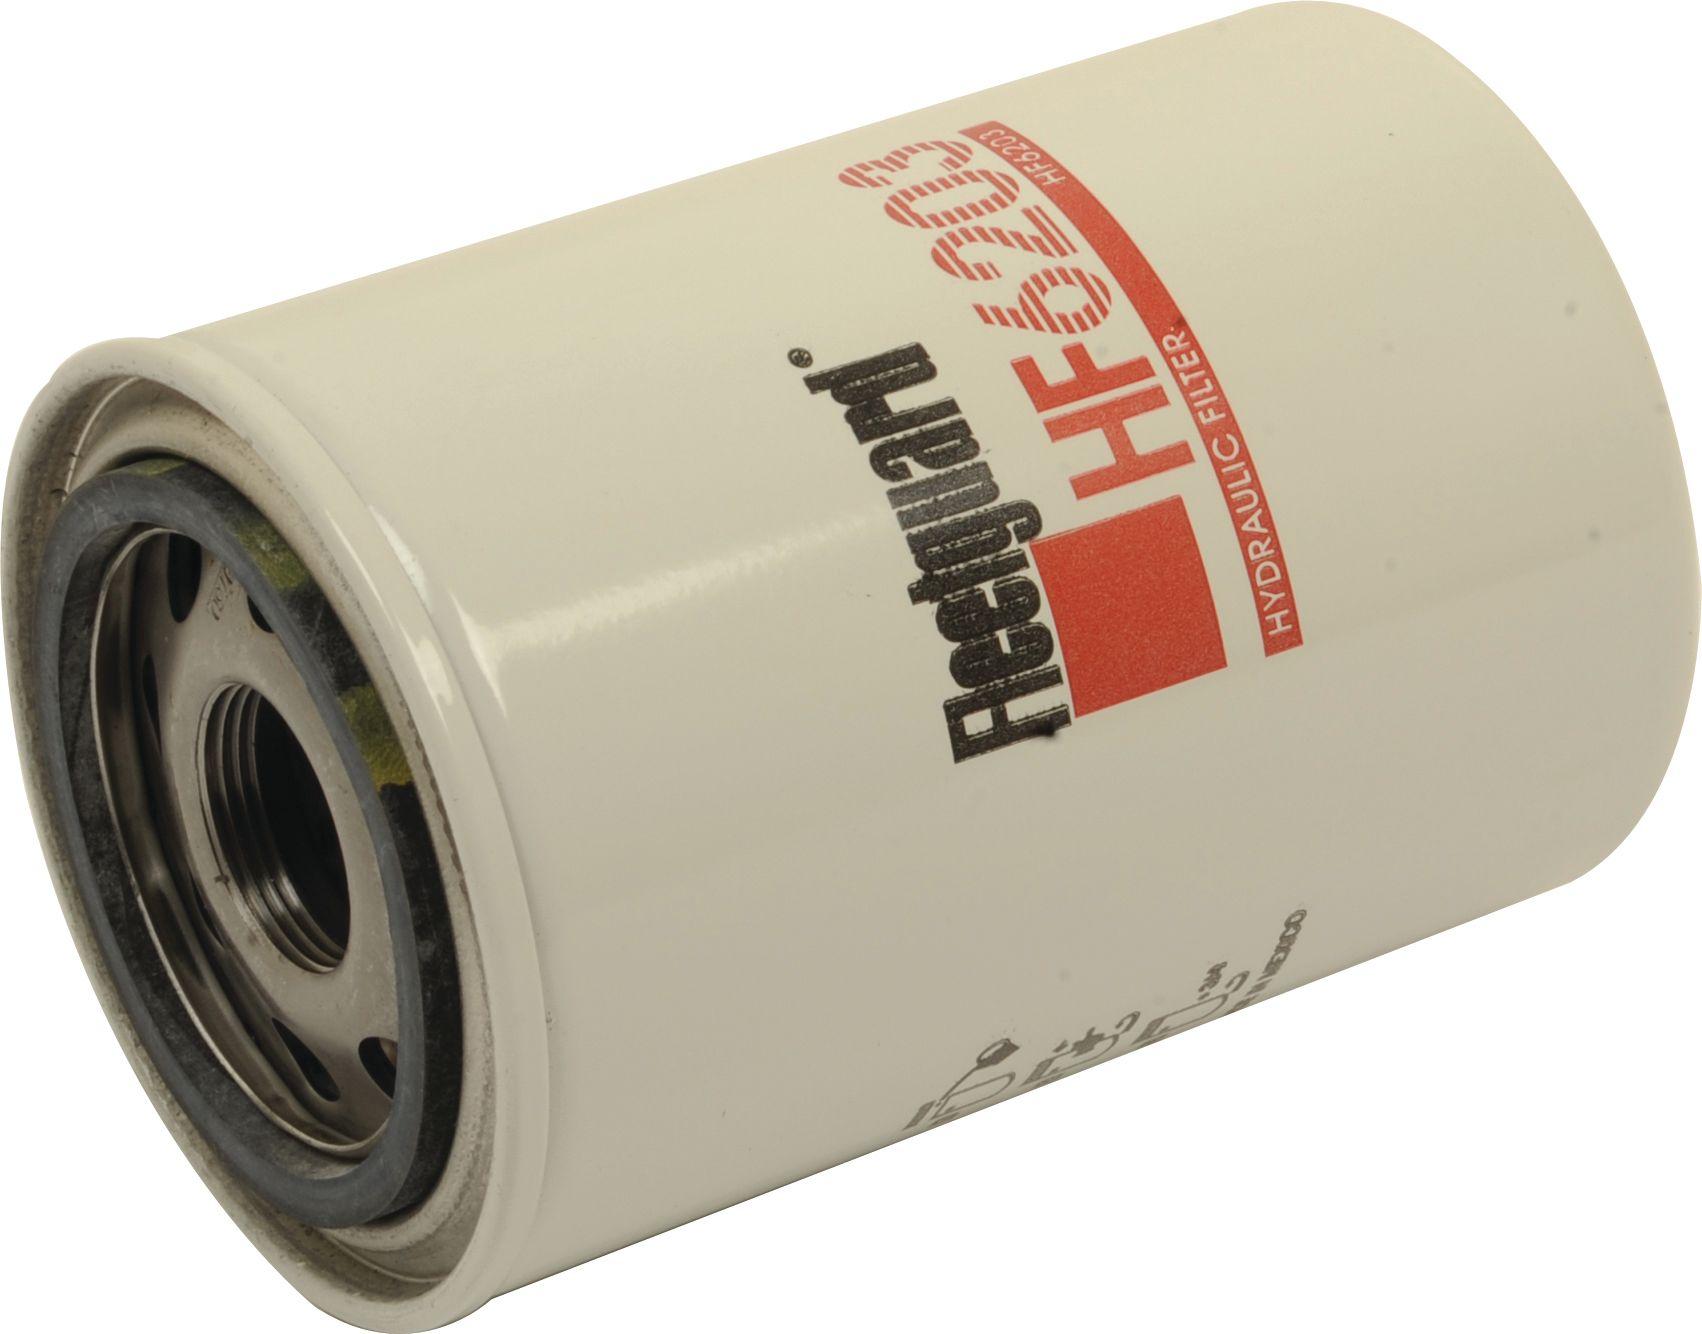 CUBCADET HYDRAULIC FILTER HF6203 76536